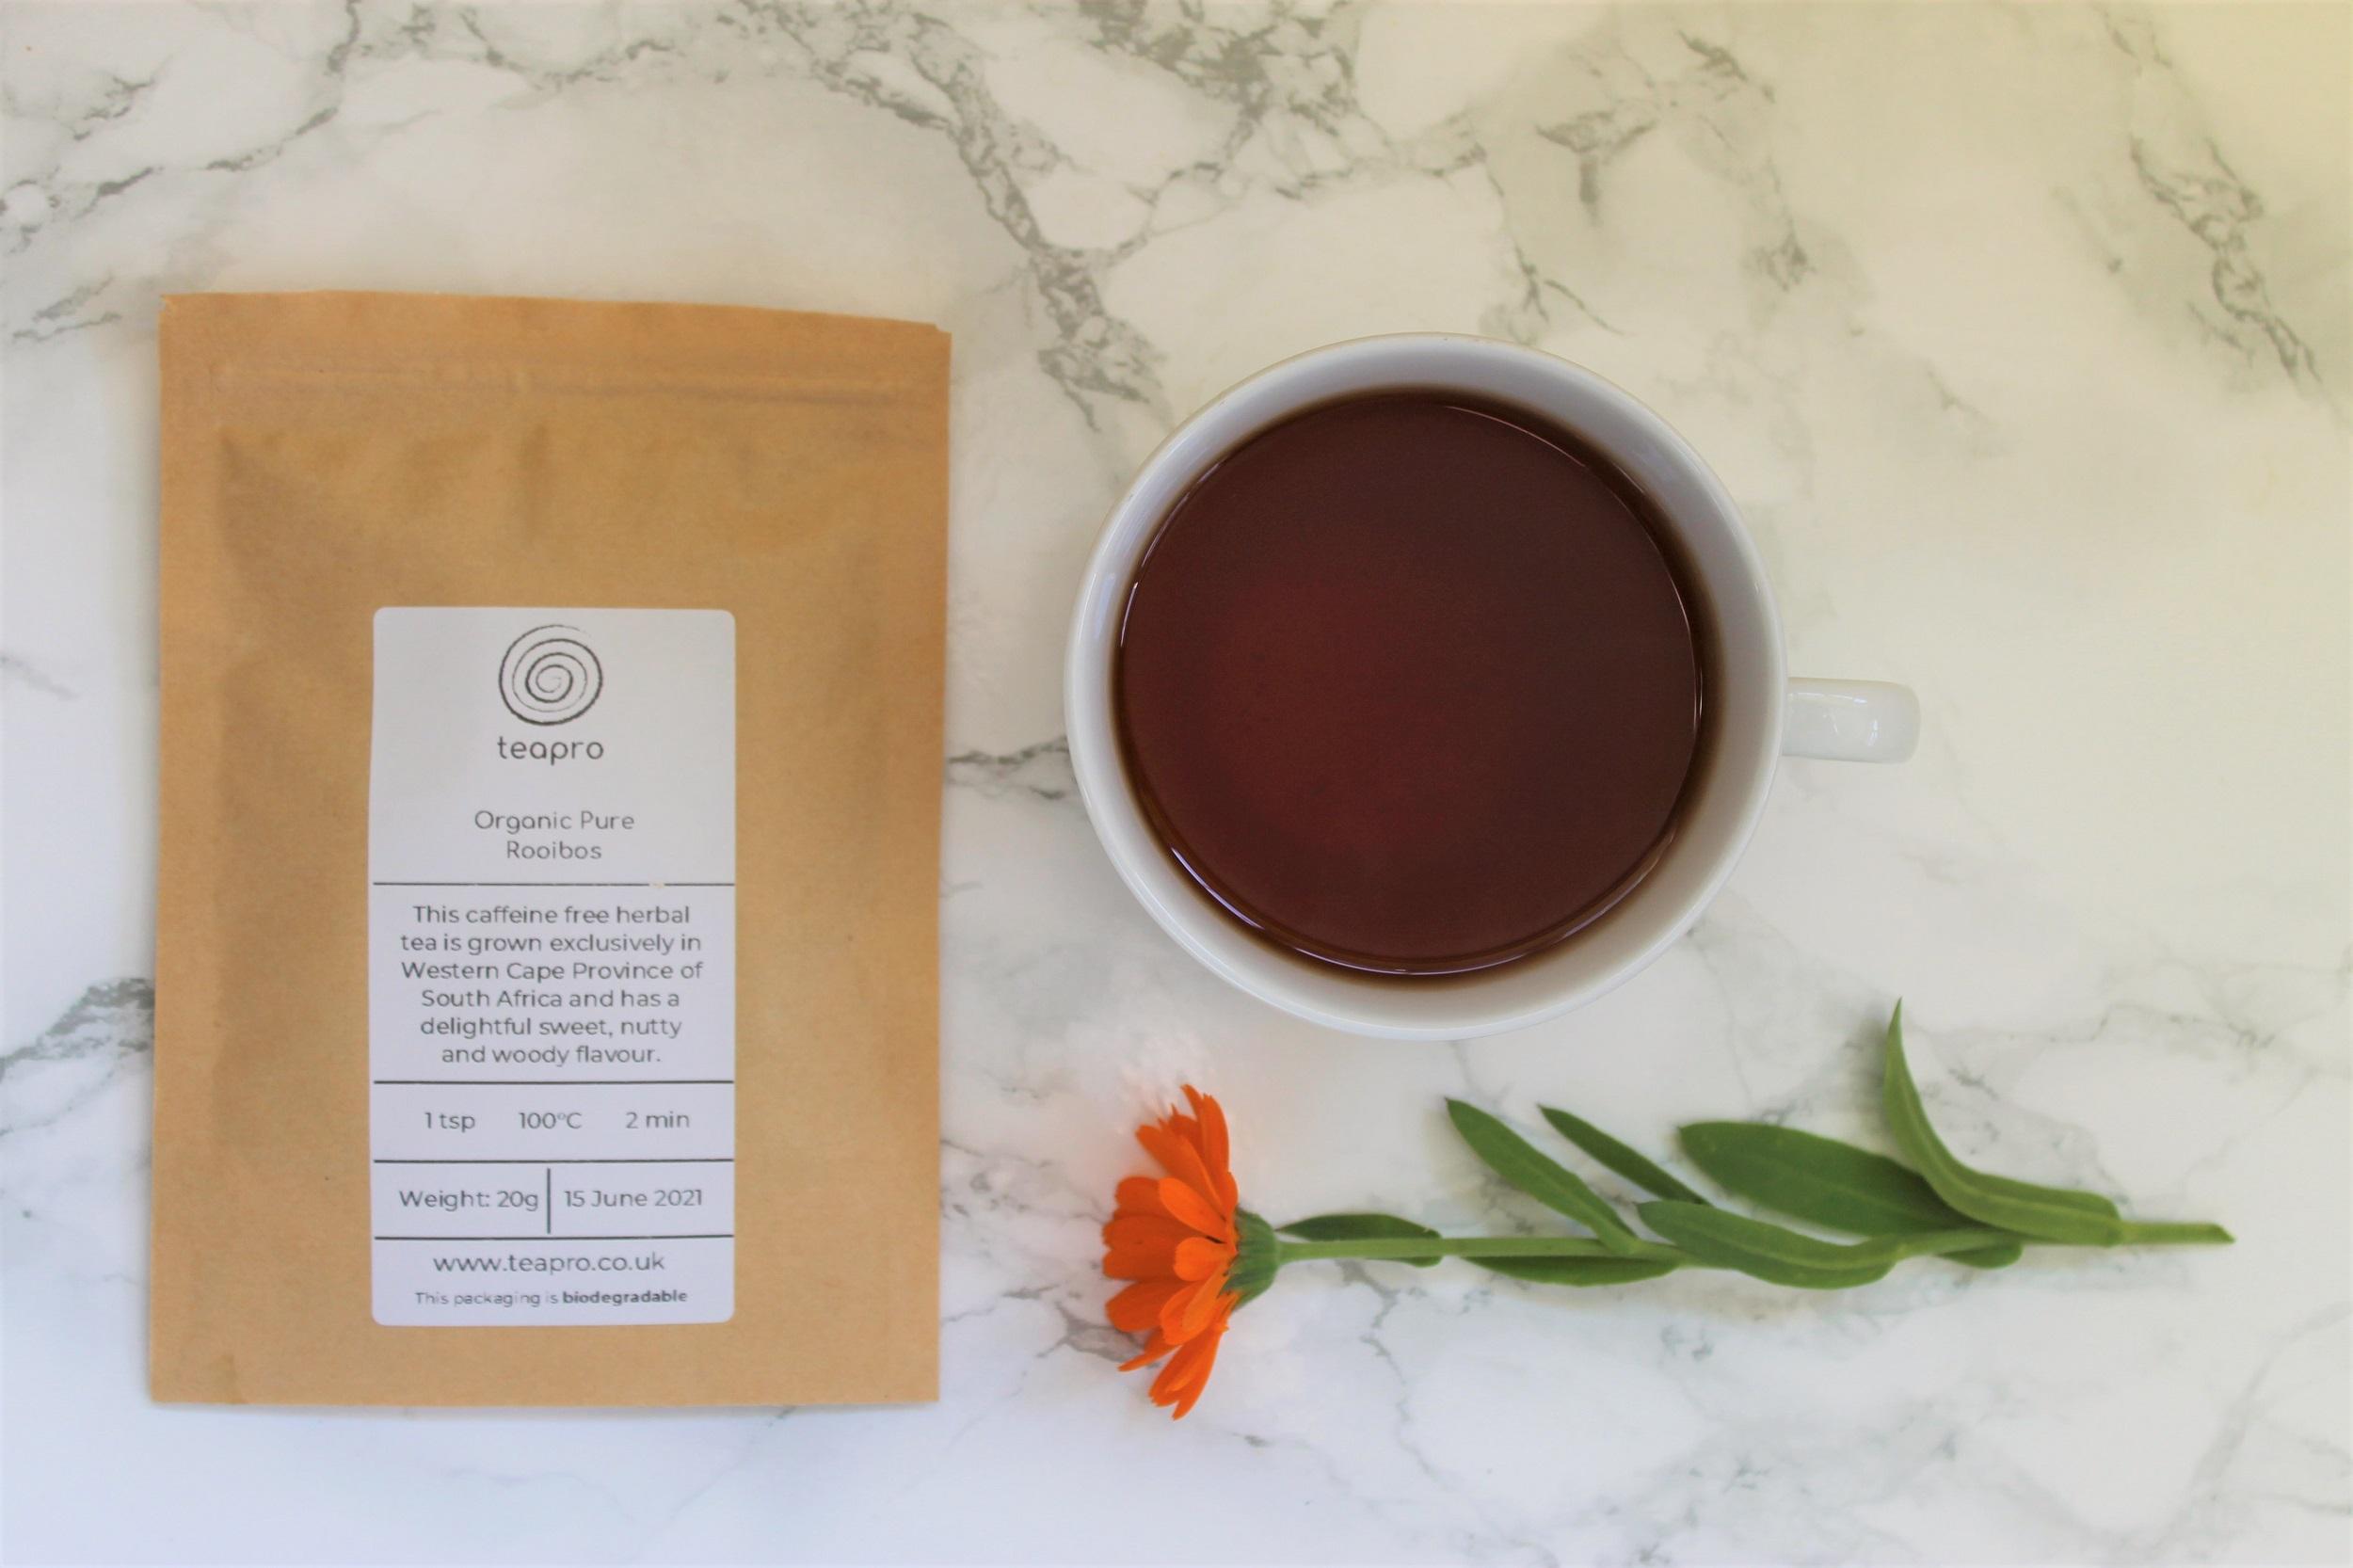 teapro red rooibos tea